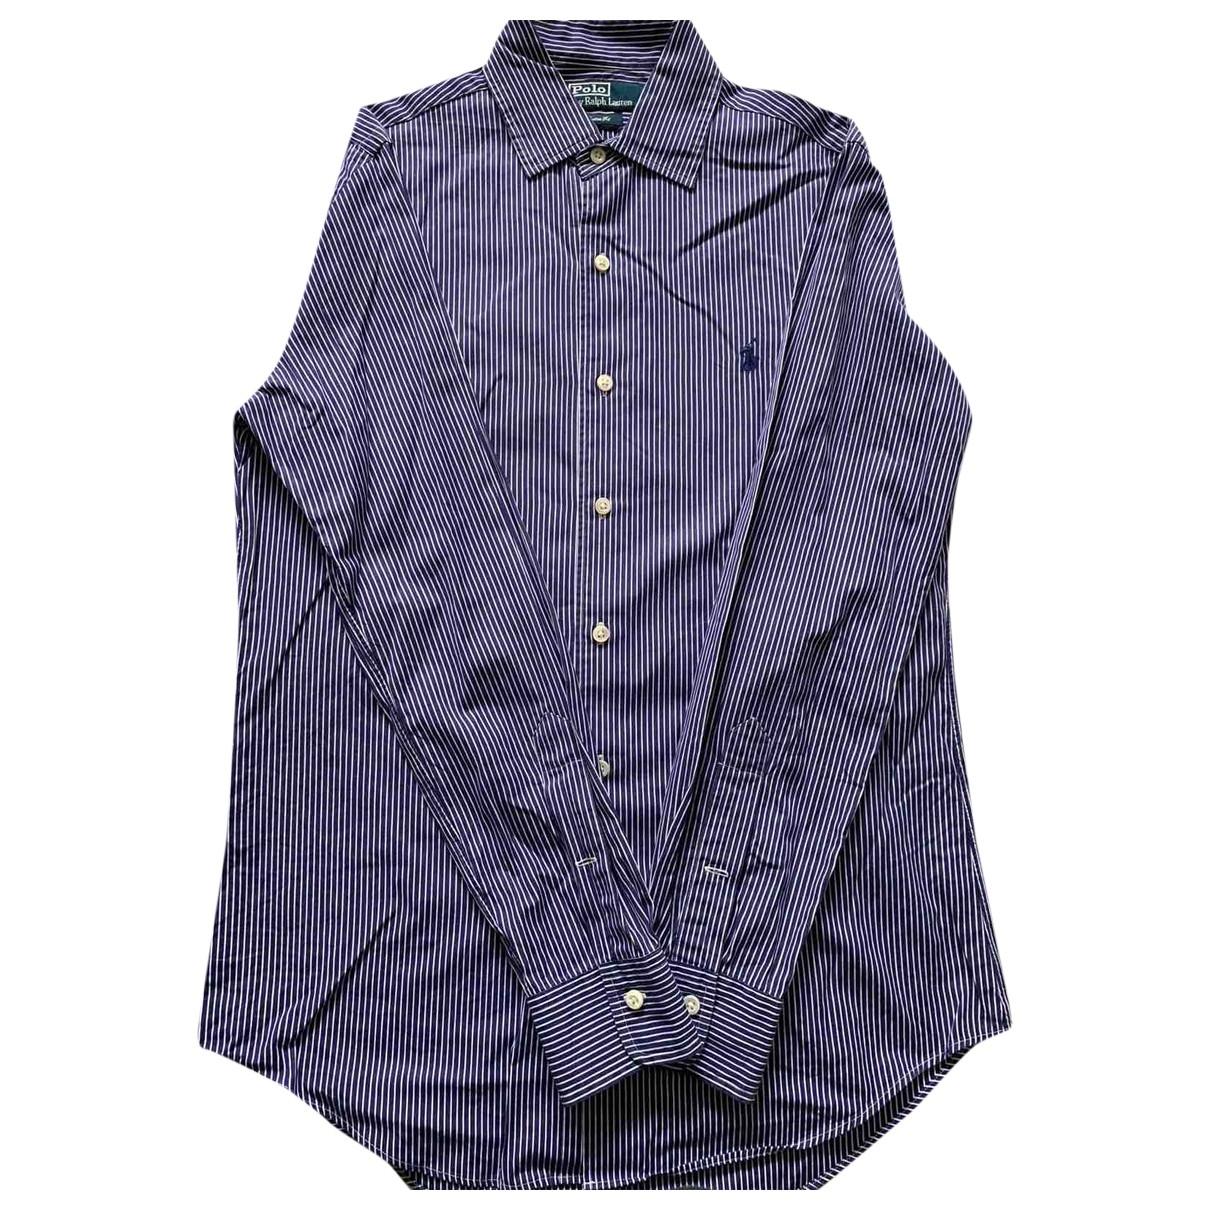 Polo Ralph Lauren \N Blue Cotton Shirts for Men S International